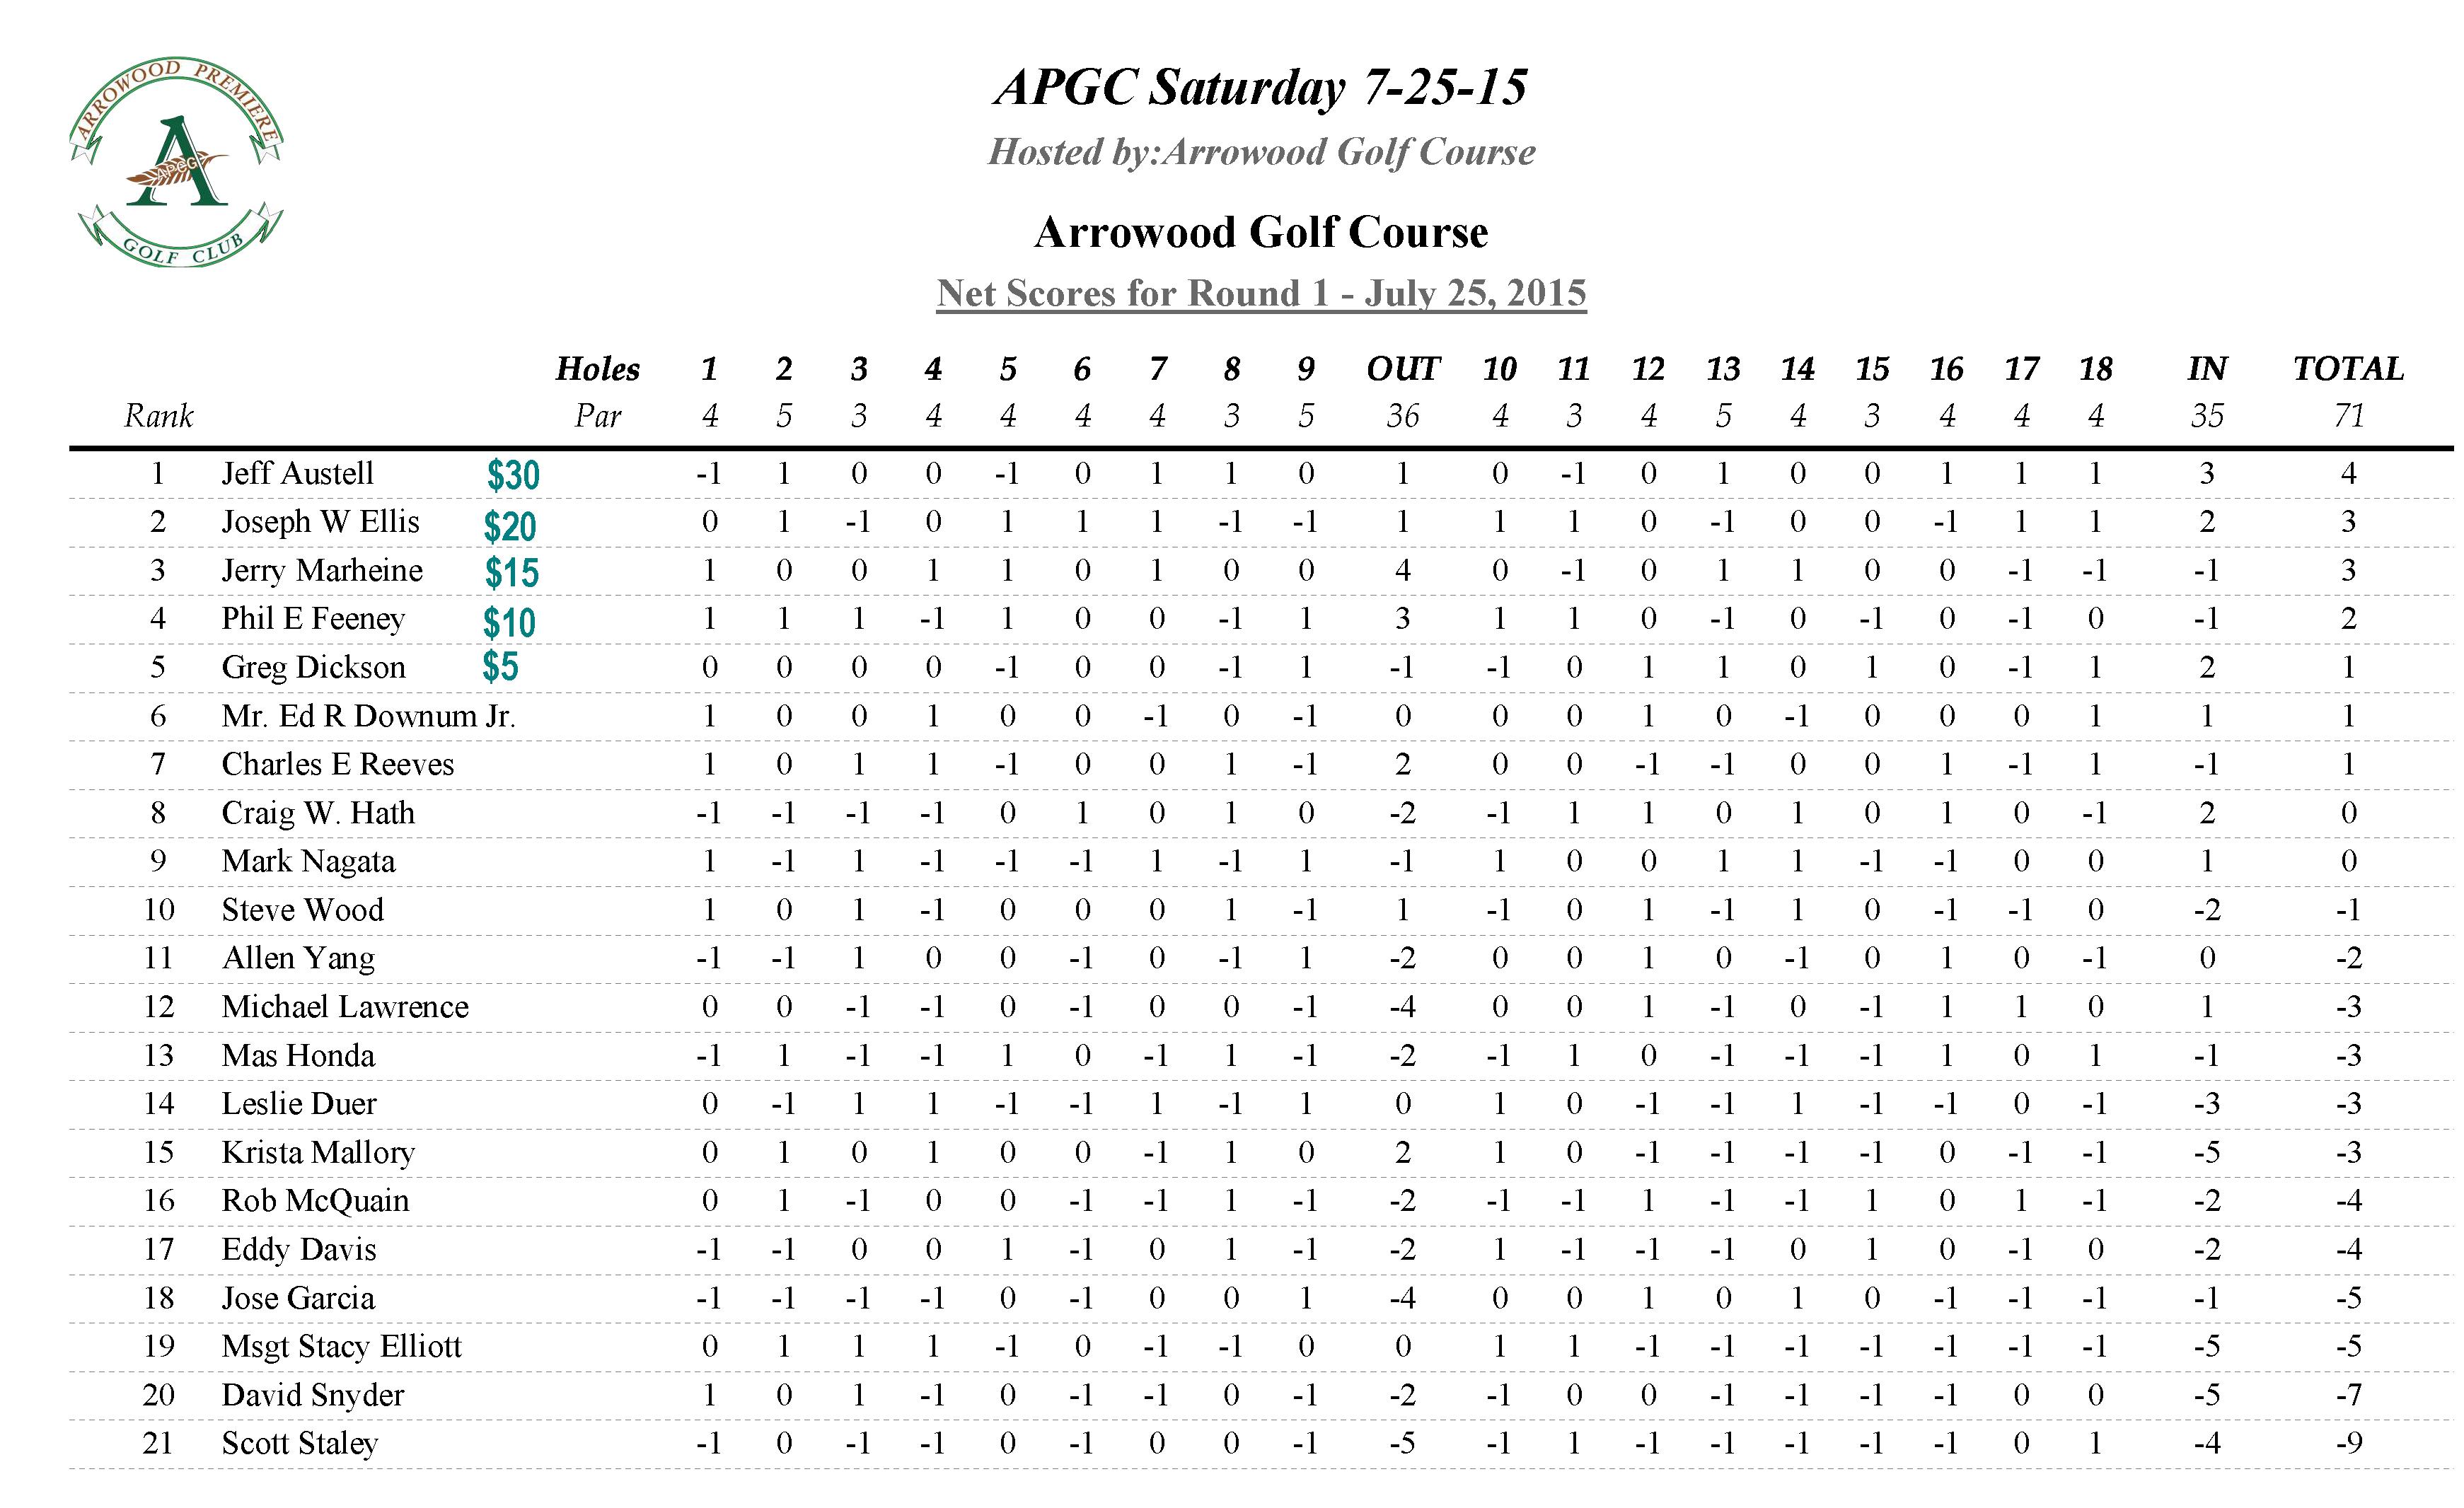 APGC Saturday 7-25-15